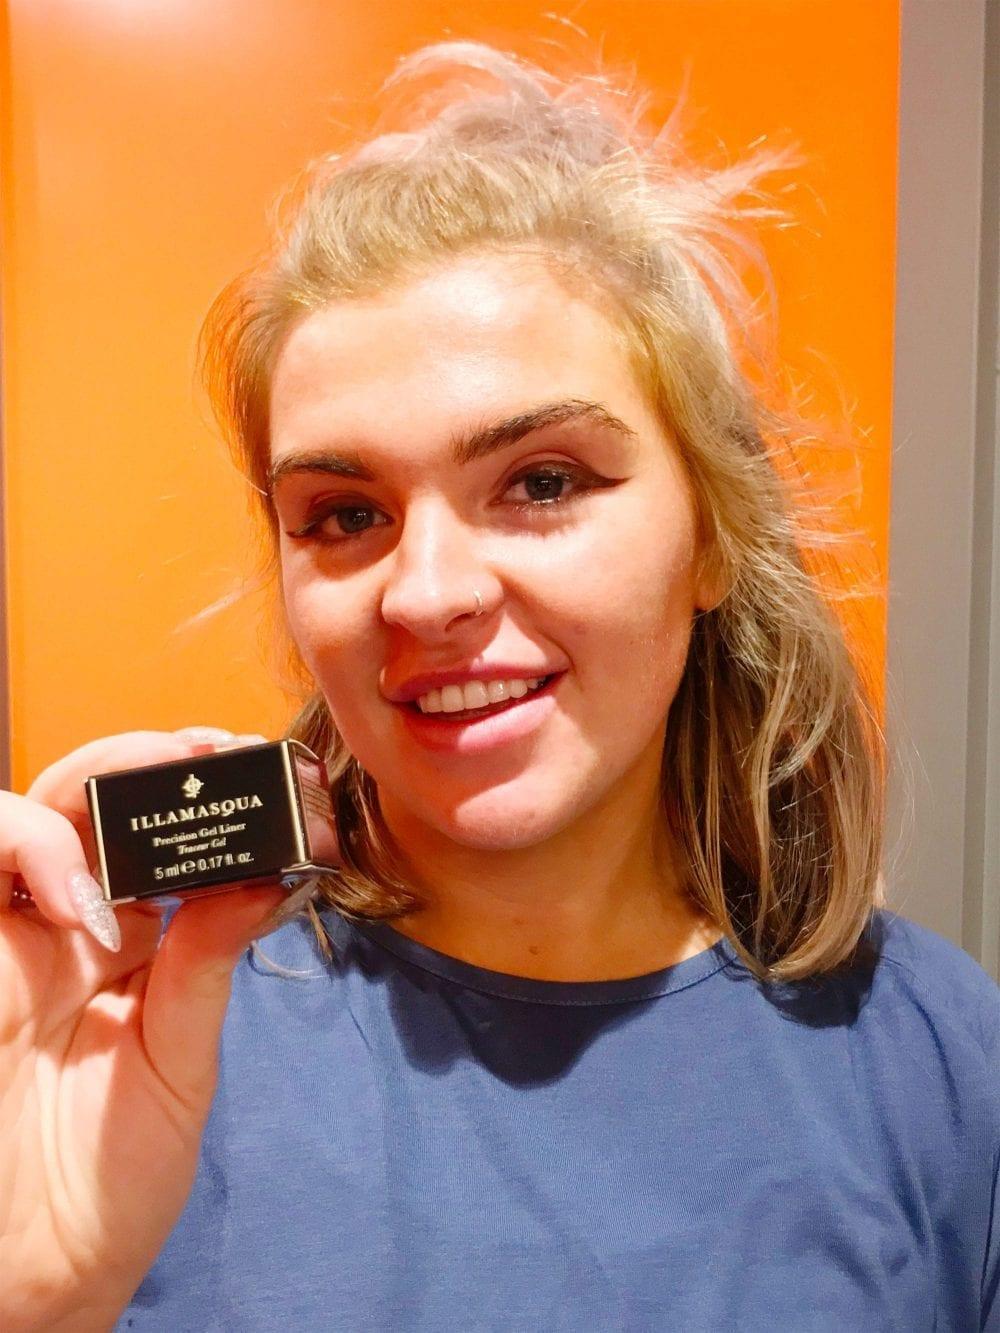 Illamasqua Eyeliner Reviuew | HQhair Blog